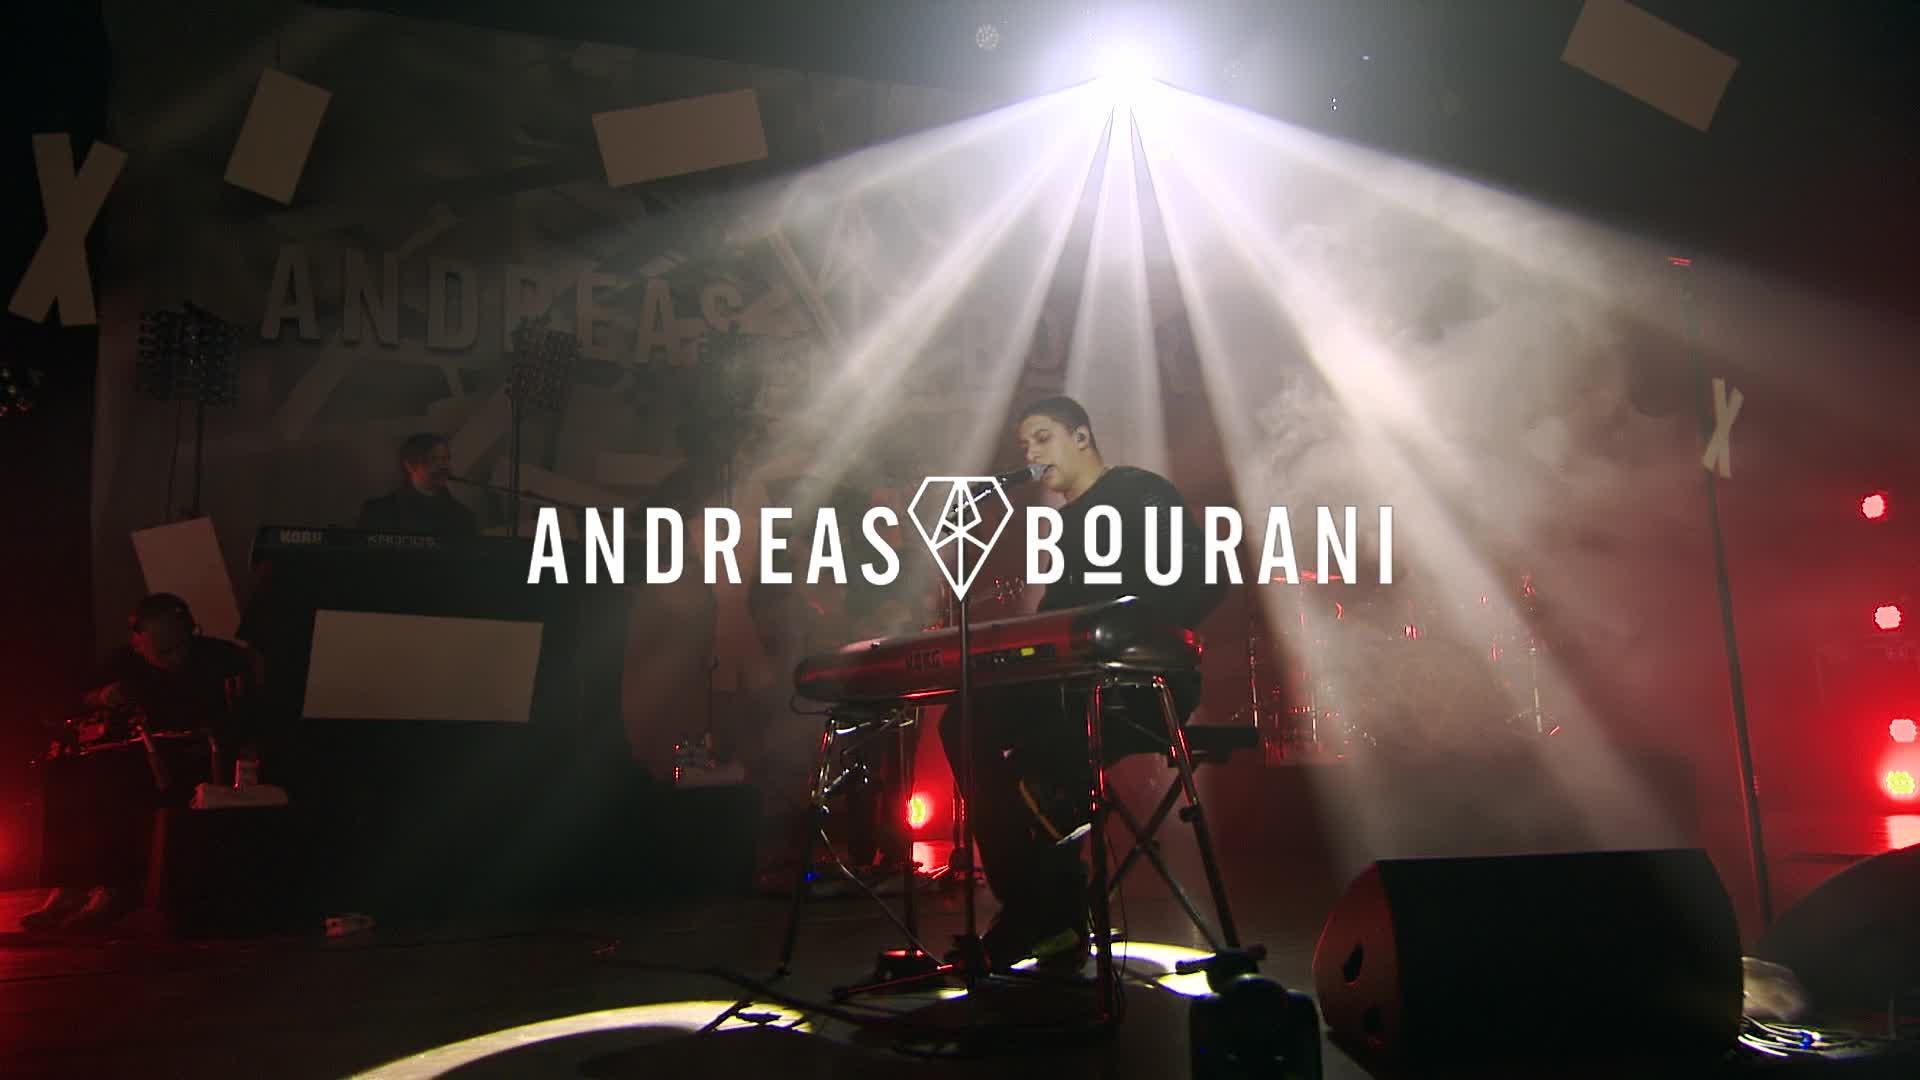 Andreas Bourani, Hey Live (Trailer)